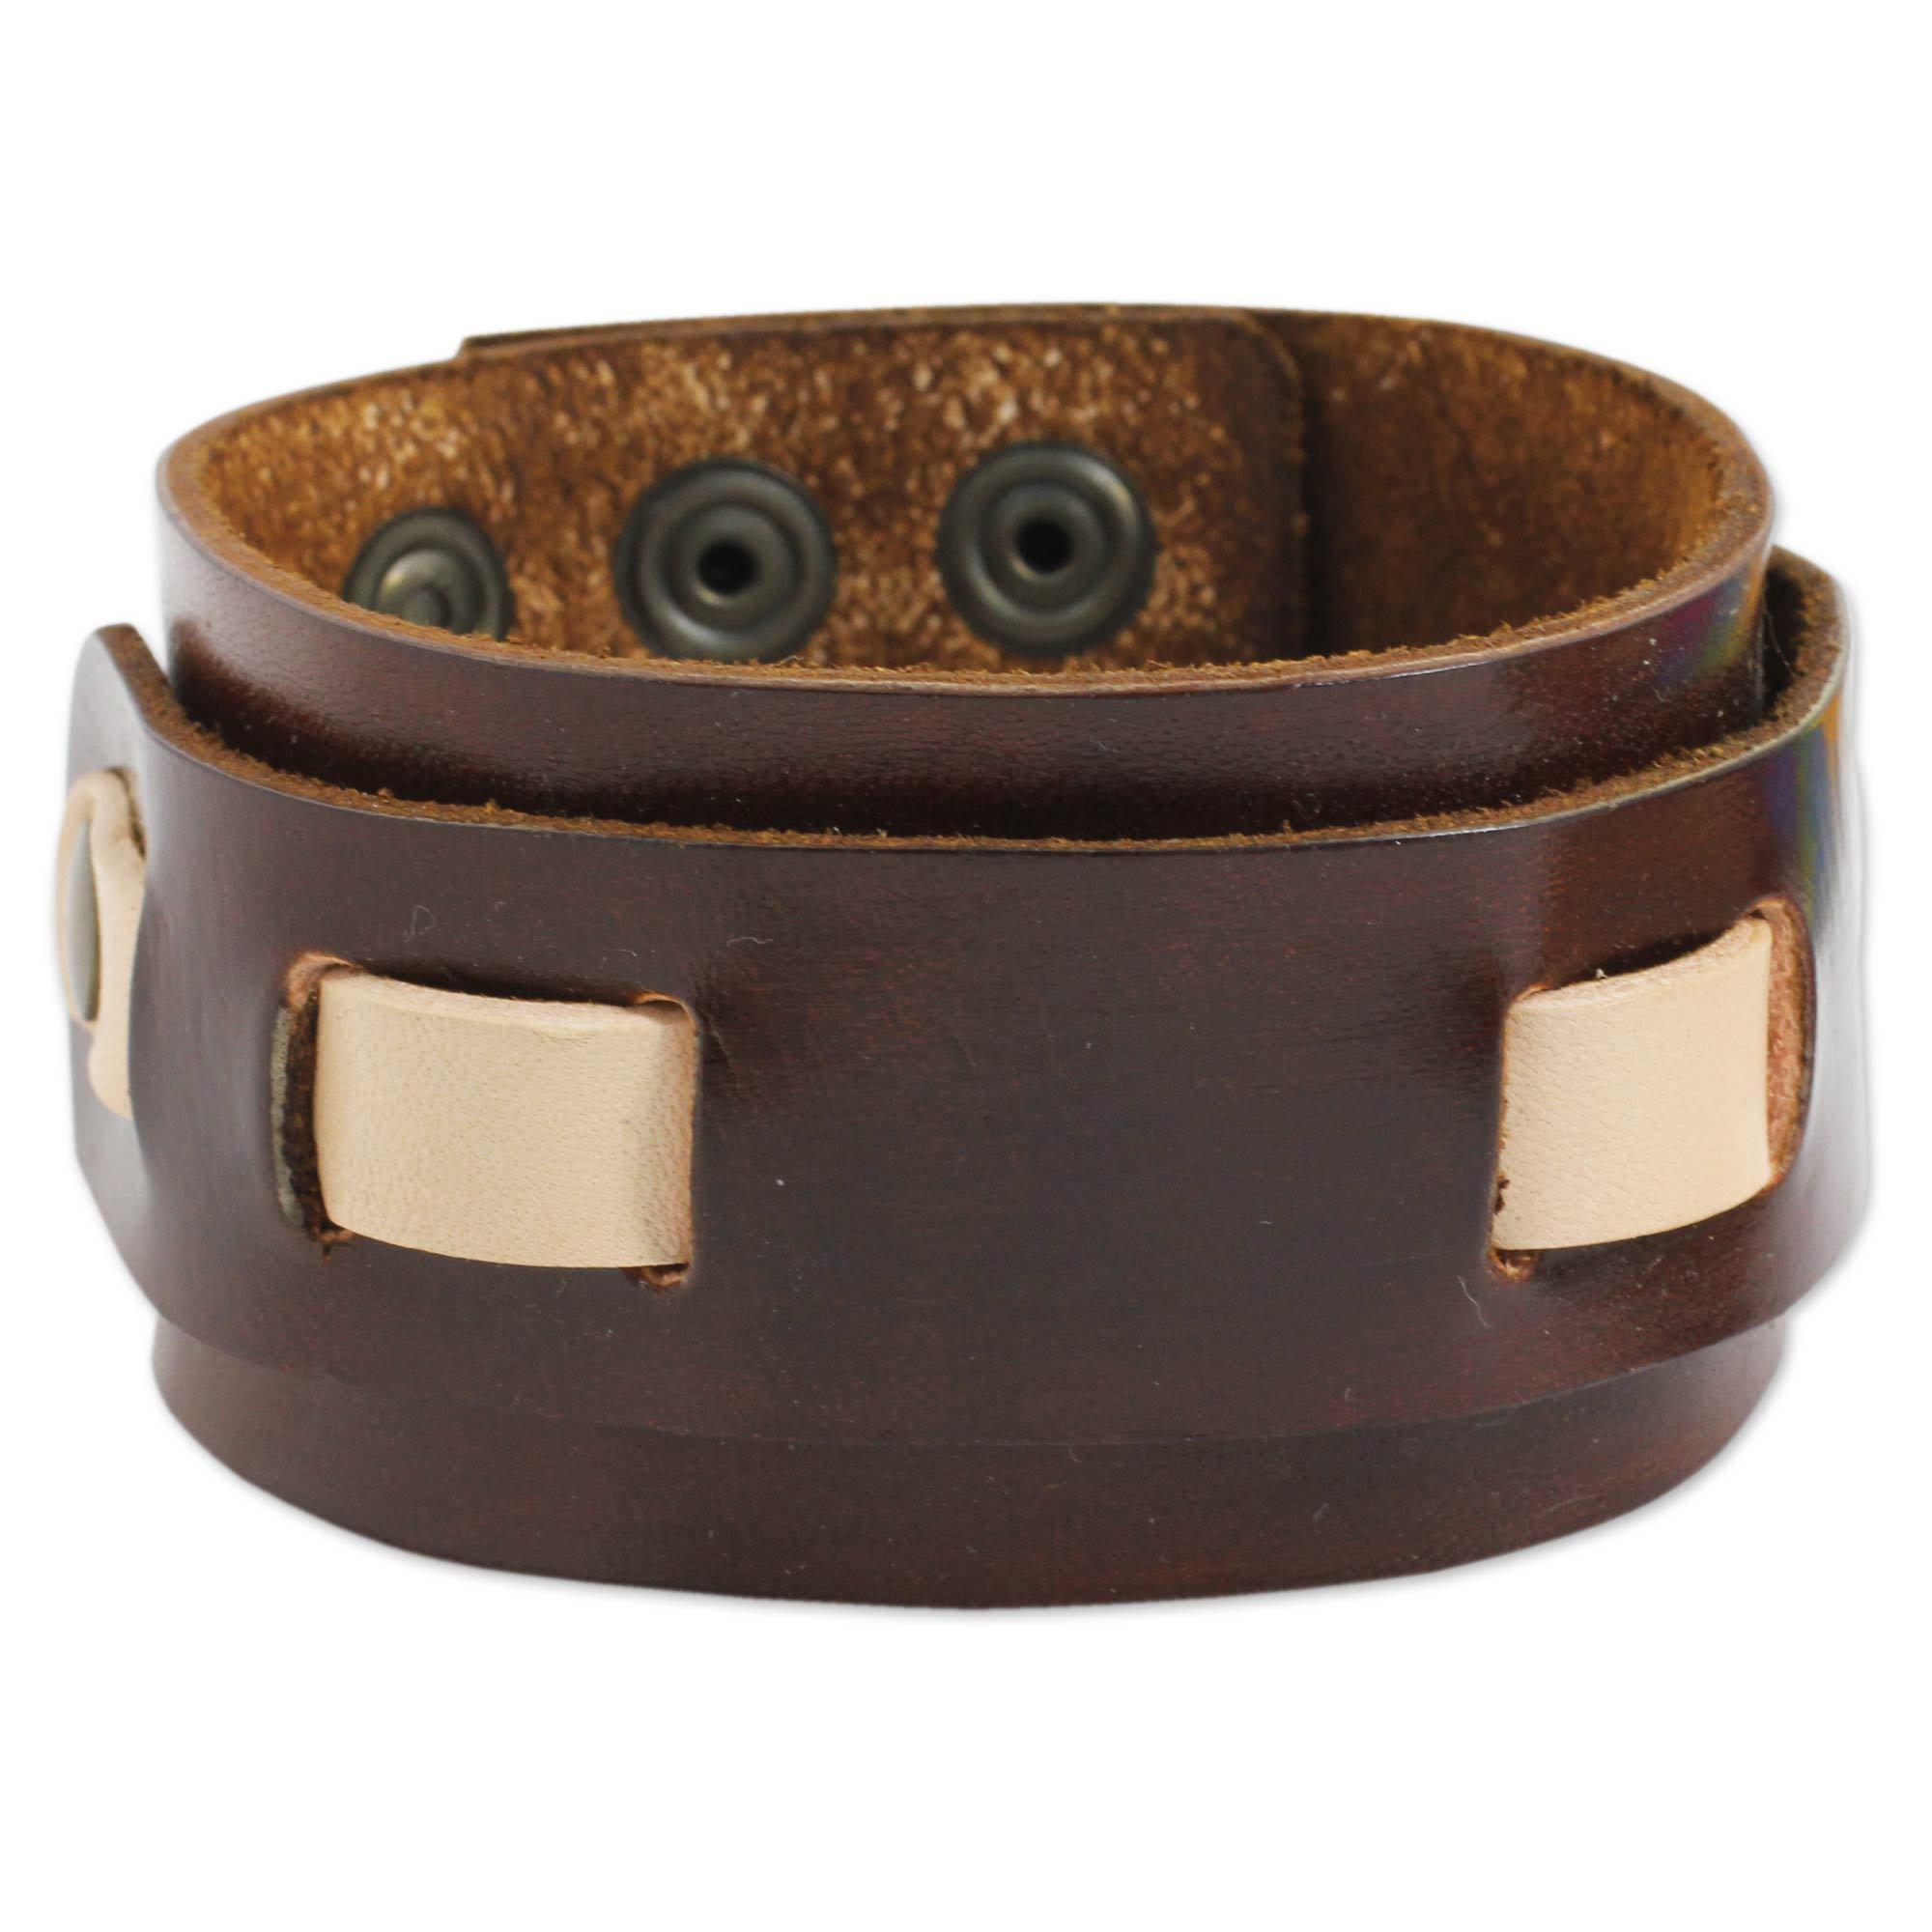 e124a2e31d06 Shop Handmade Men's Leather 'Voyager' Wristband Bracelet (Thailand ...